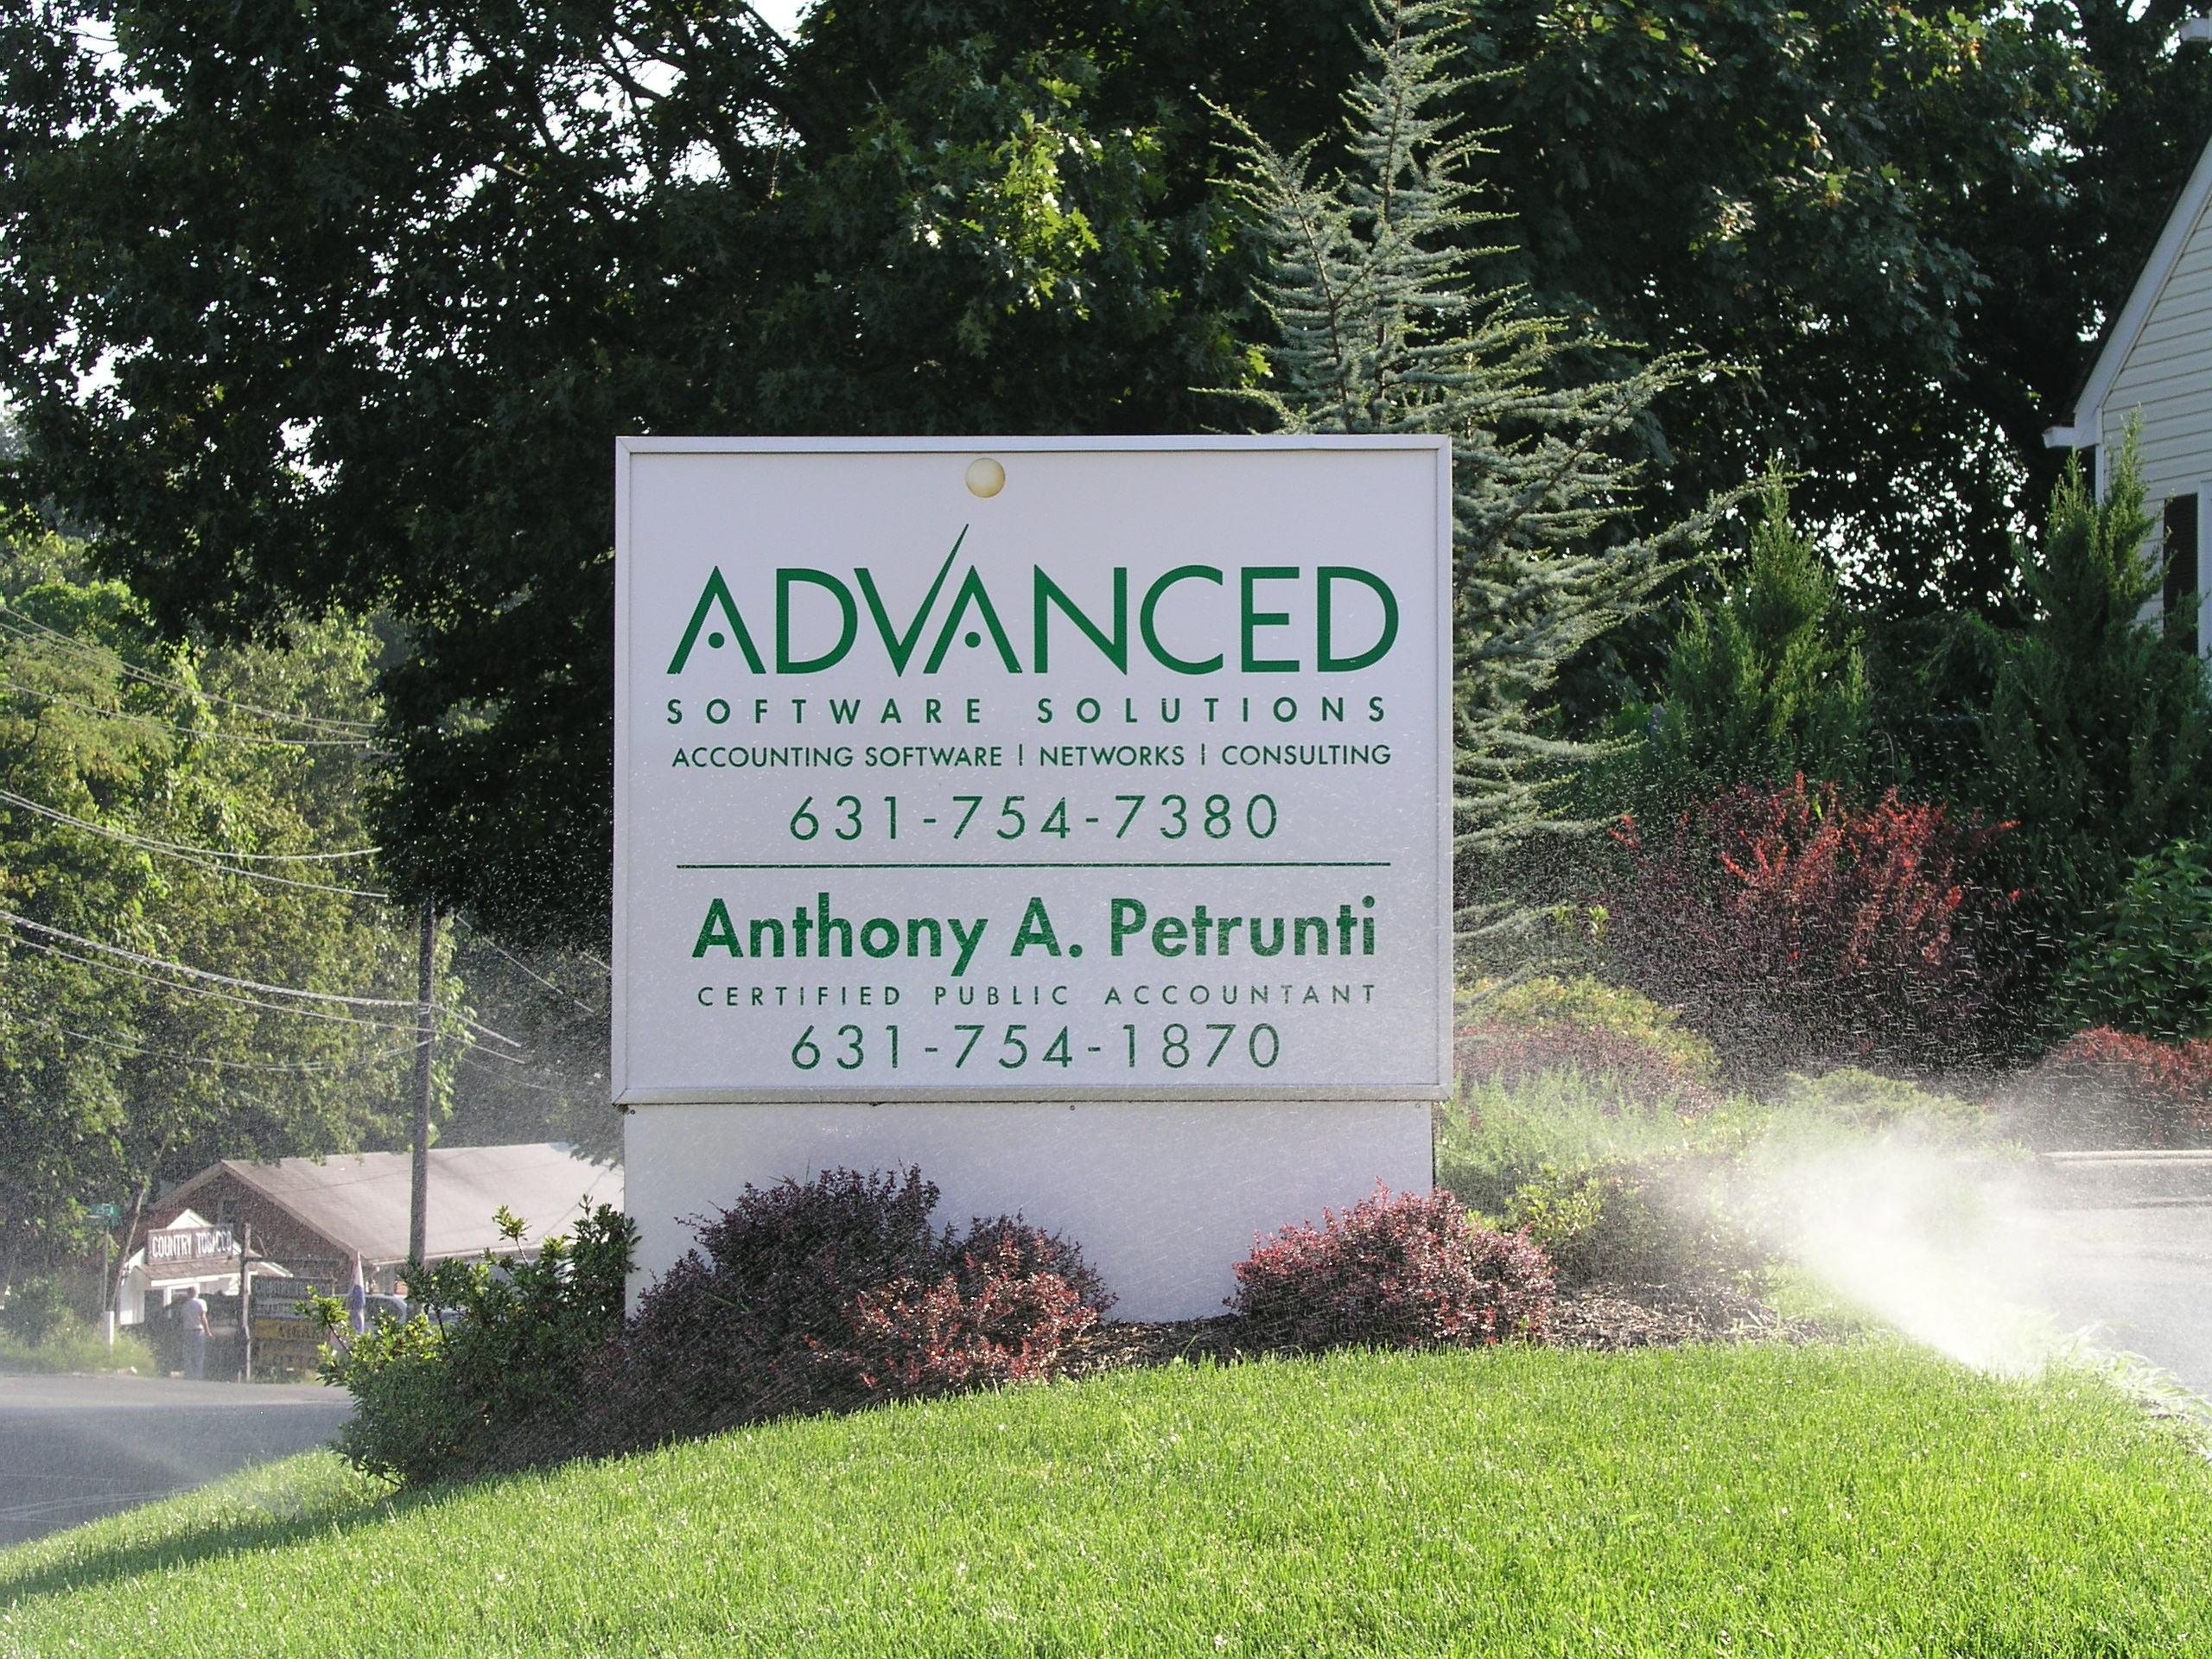 Advanced Software